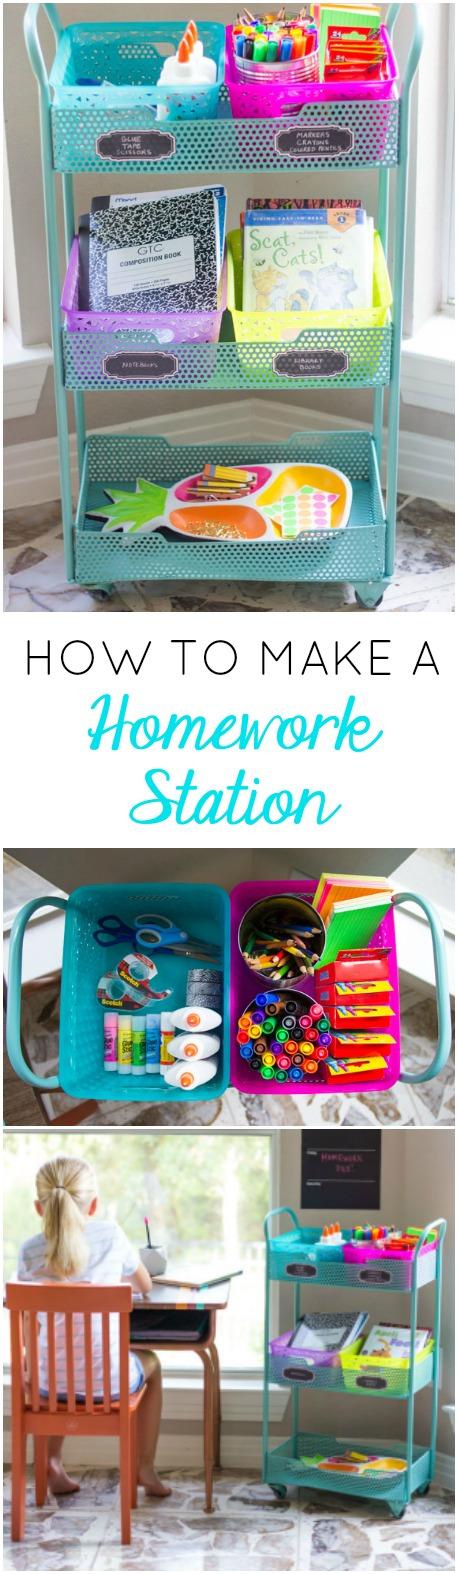 Turn a cart into a DIY homework station - so handy!